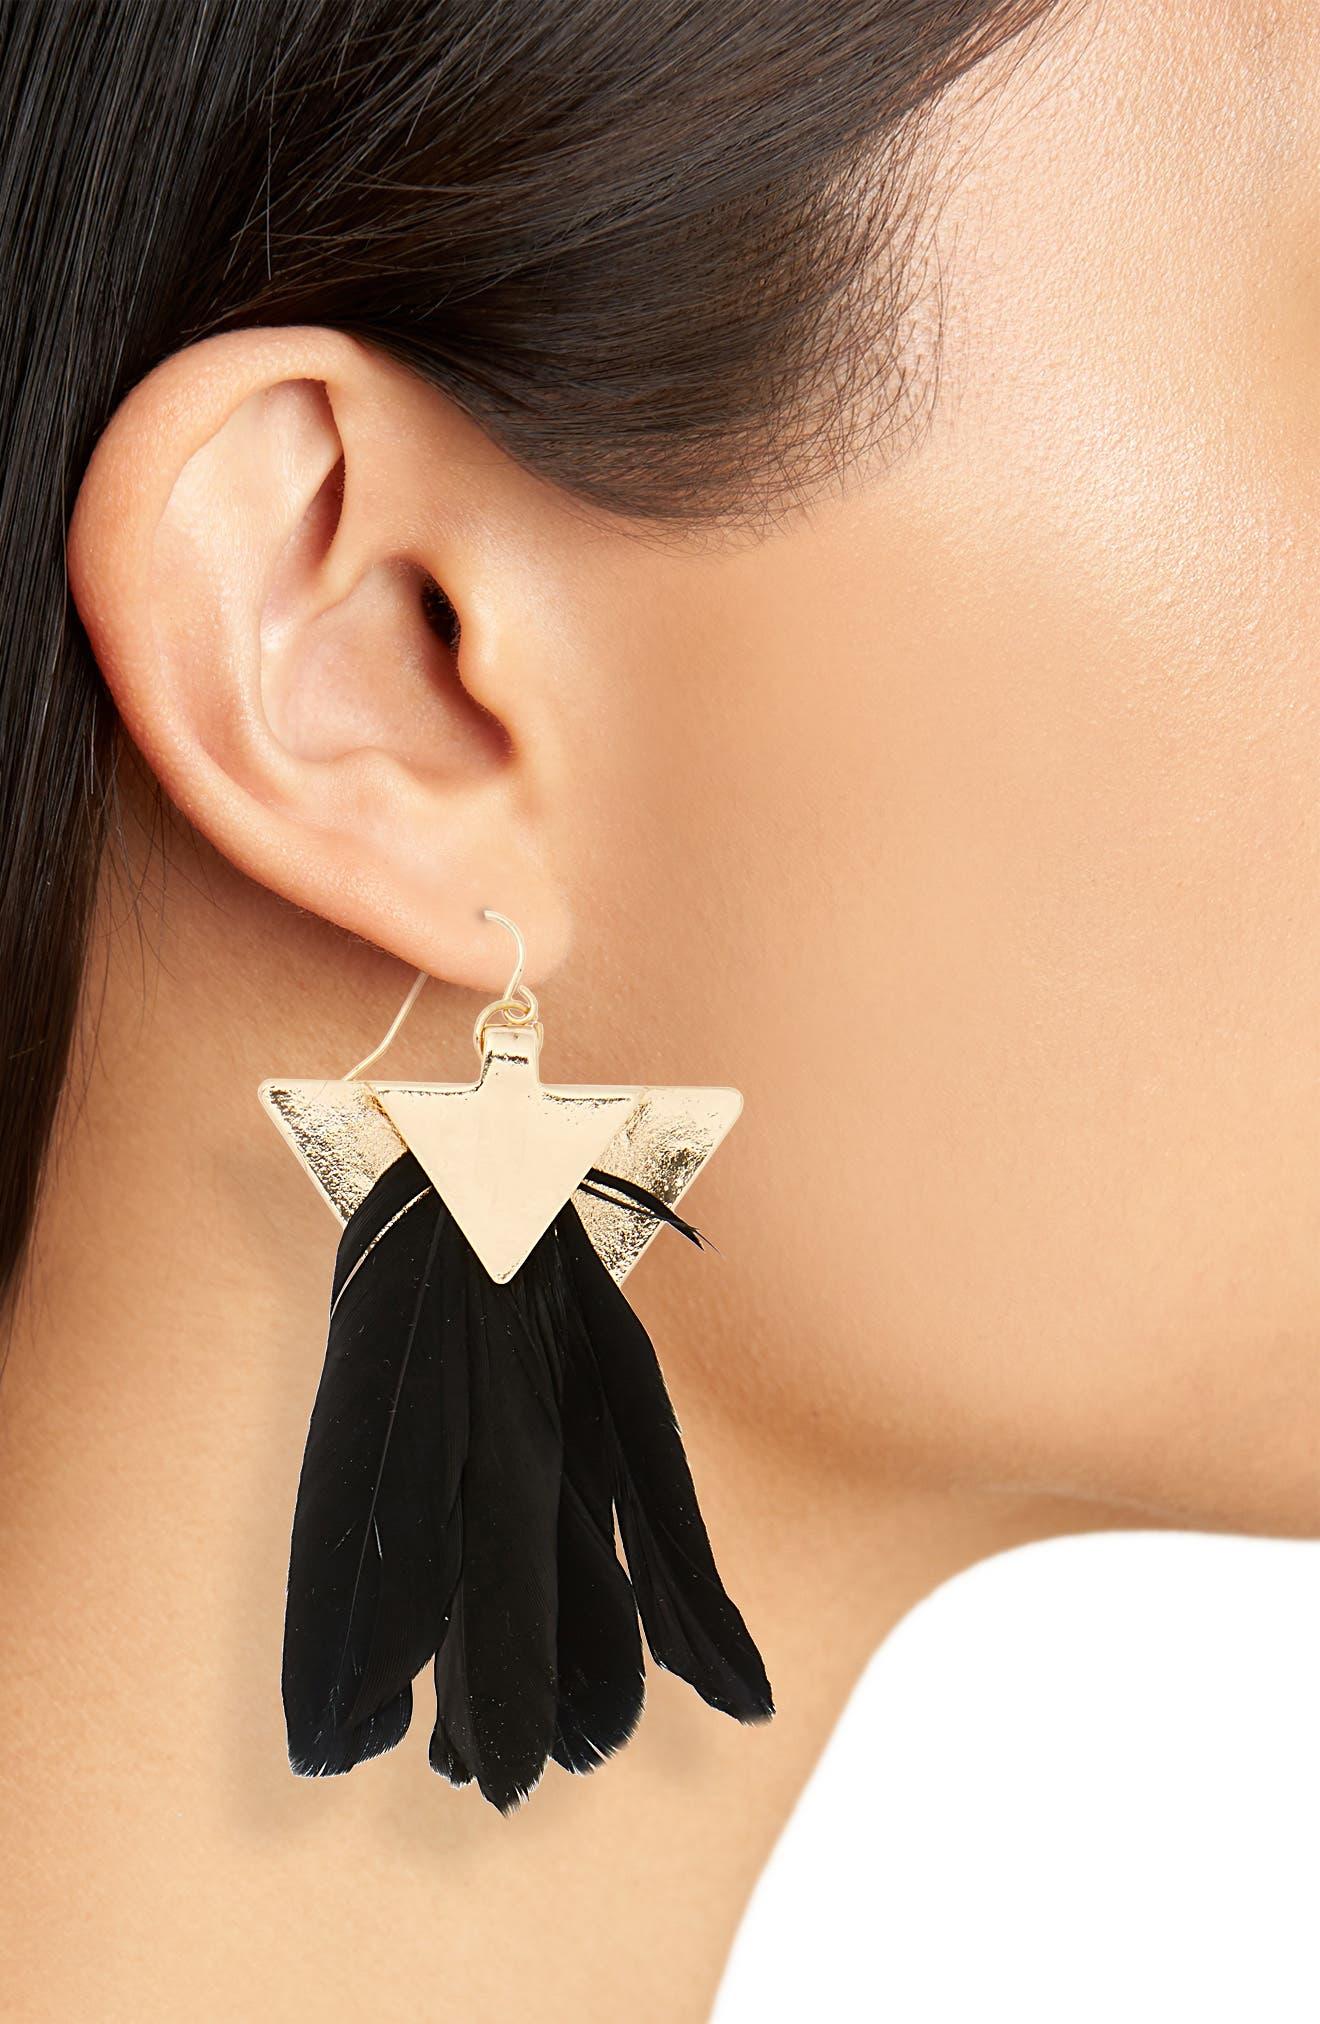 Feather Fan Earrings,                             Alternate thumbnail 2, color,                             Gold/ Black